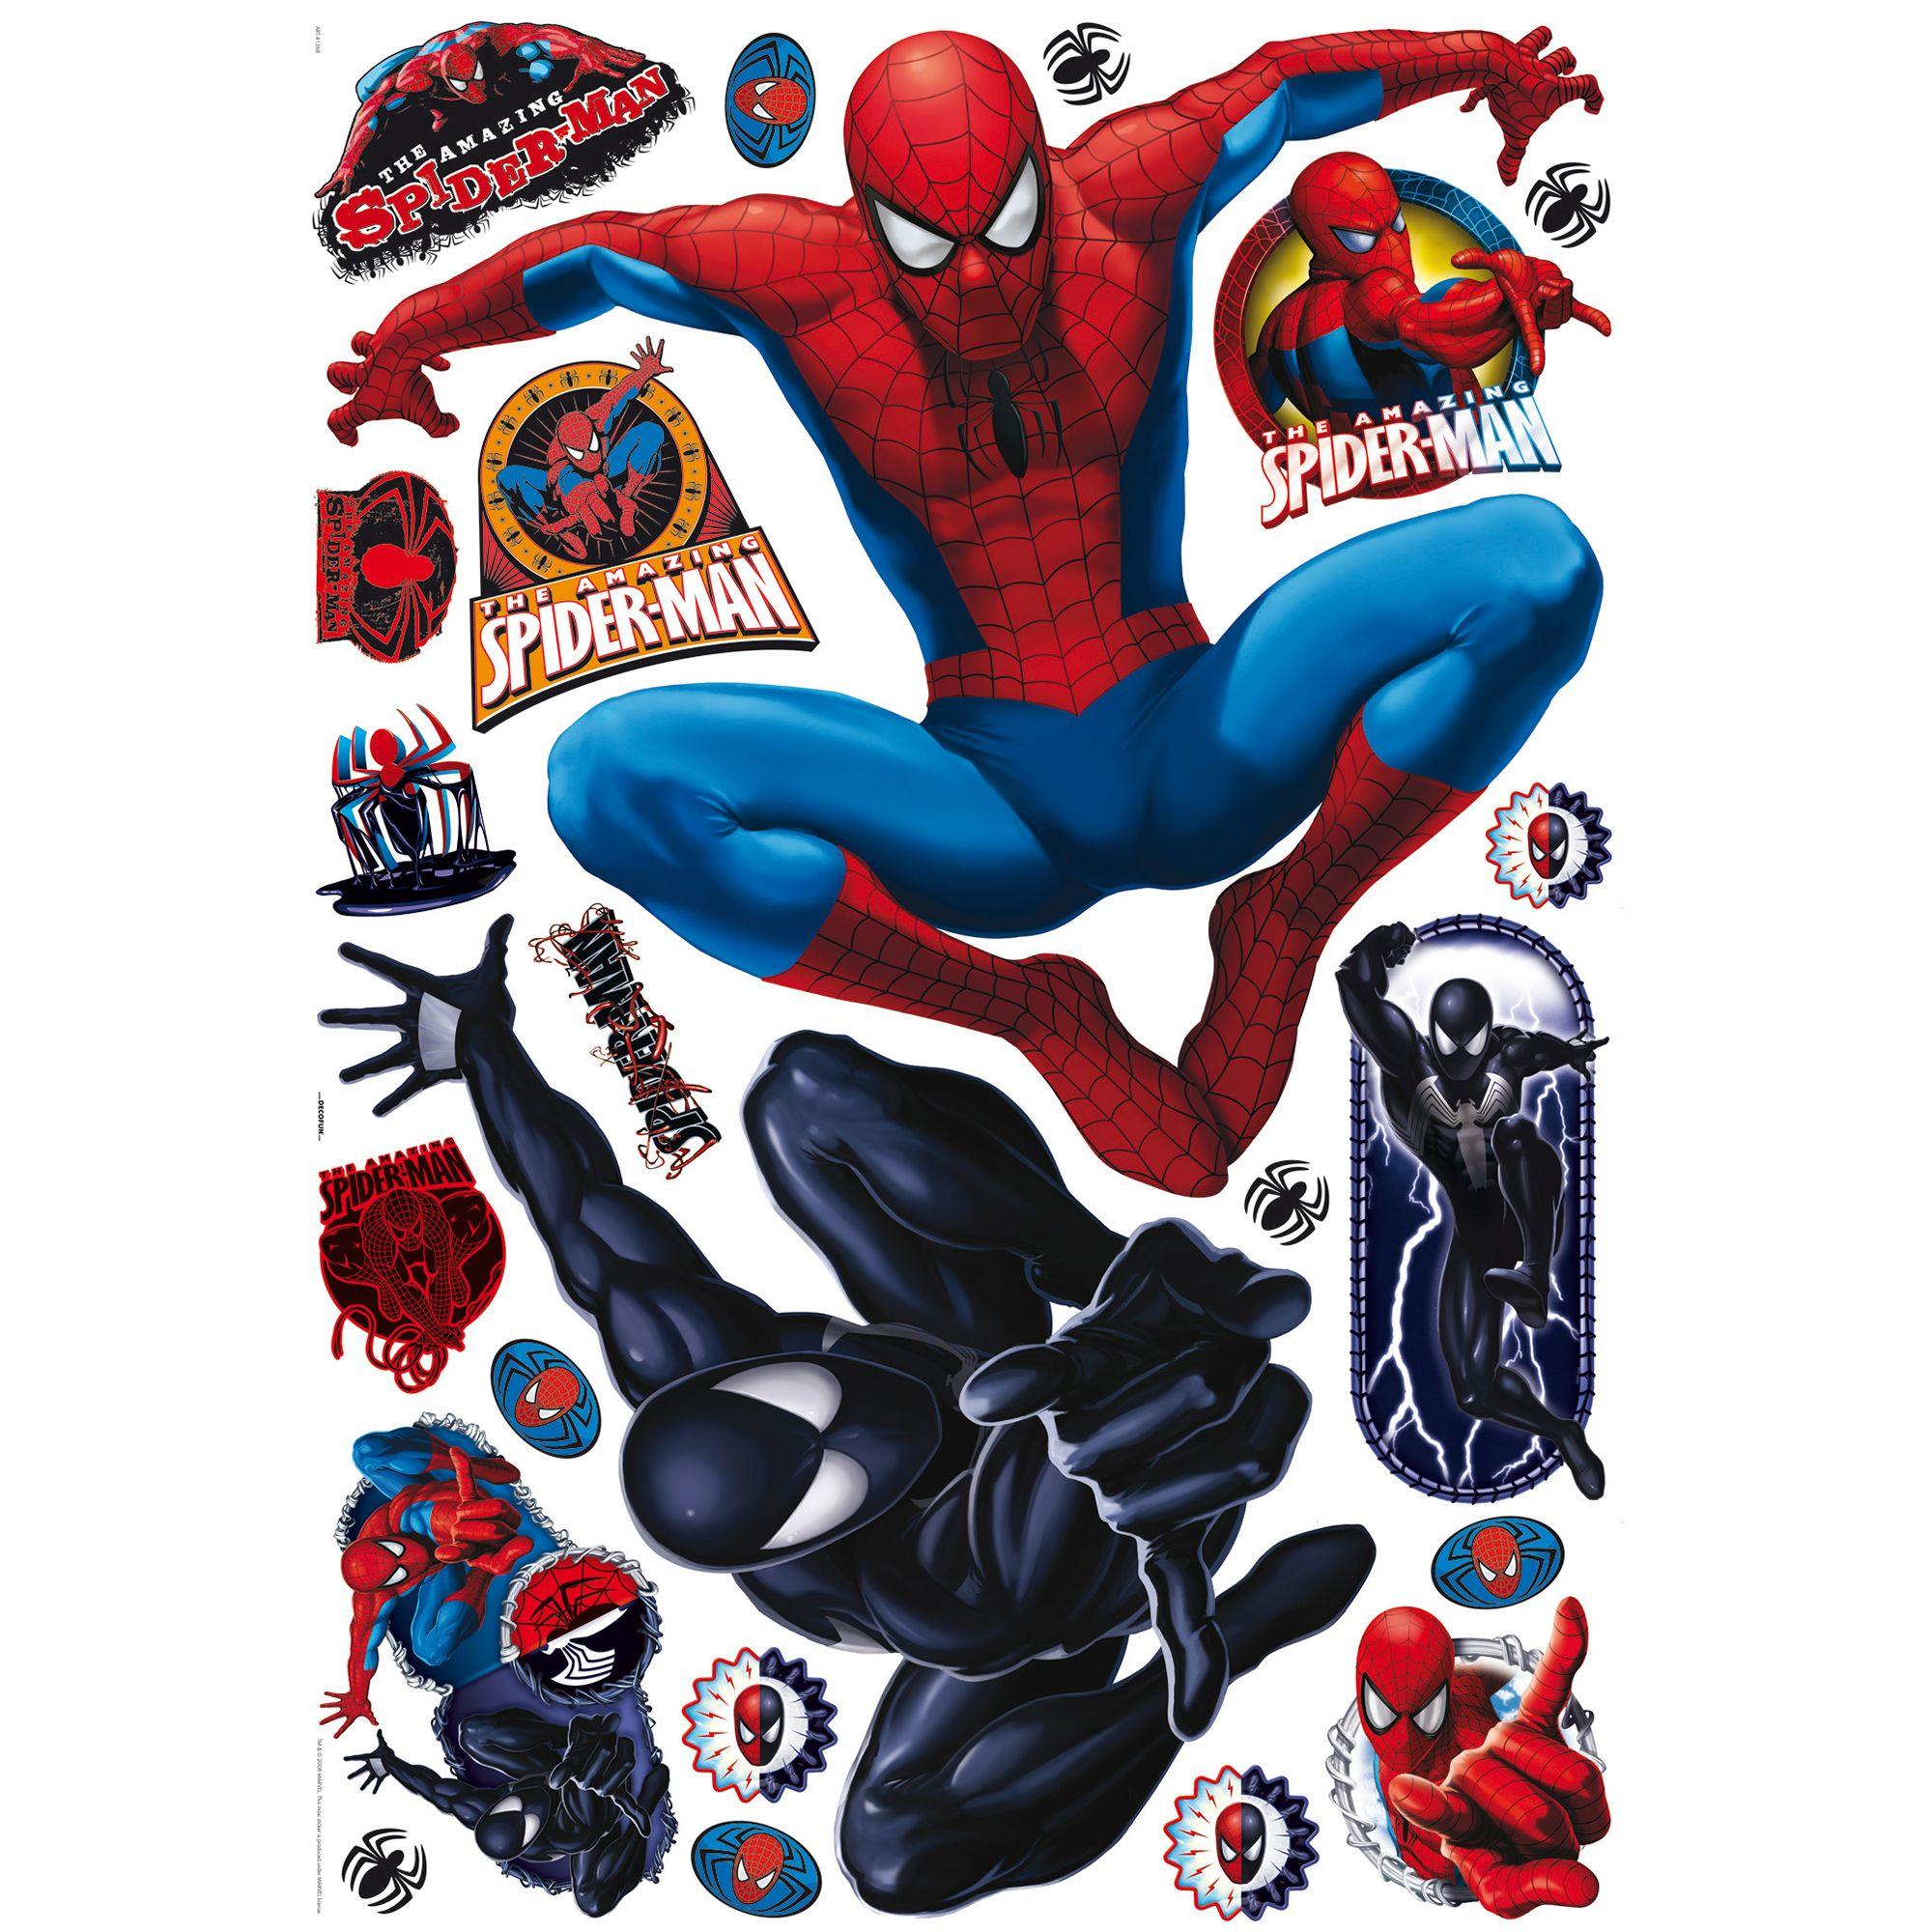 Marvel Spiderman Multicolour Self Adhesive Wall Sticker L 1000mm W 700mm Departments Diy At B Q